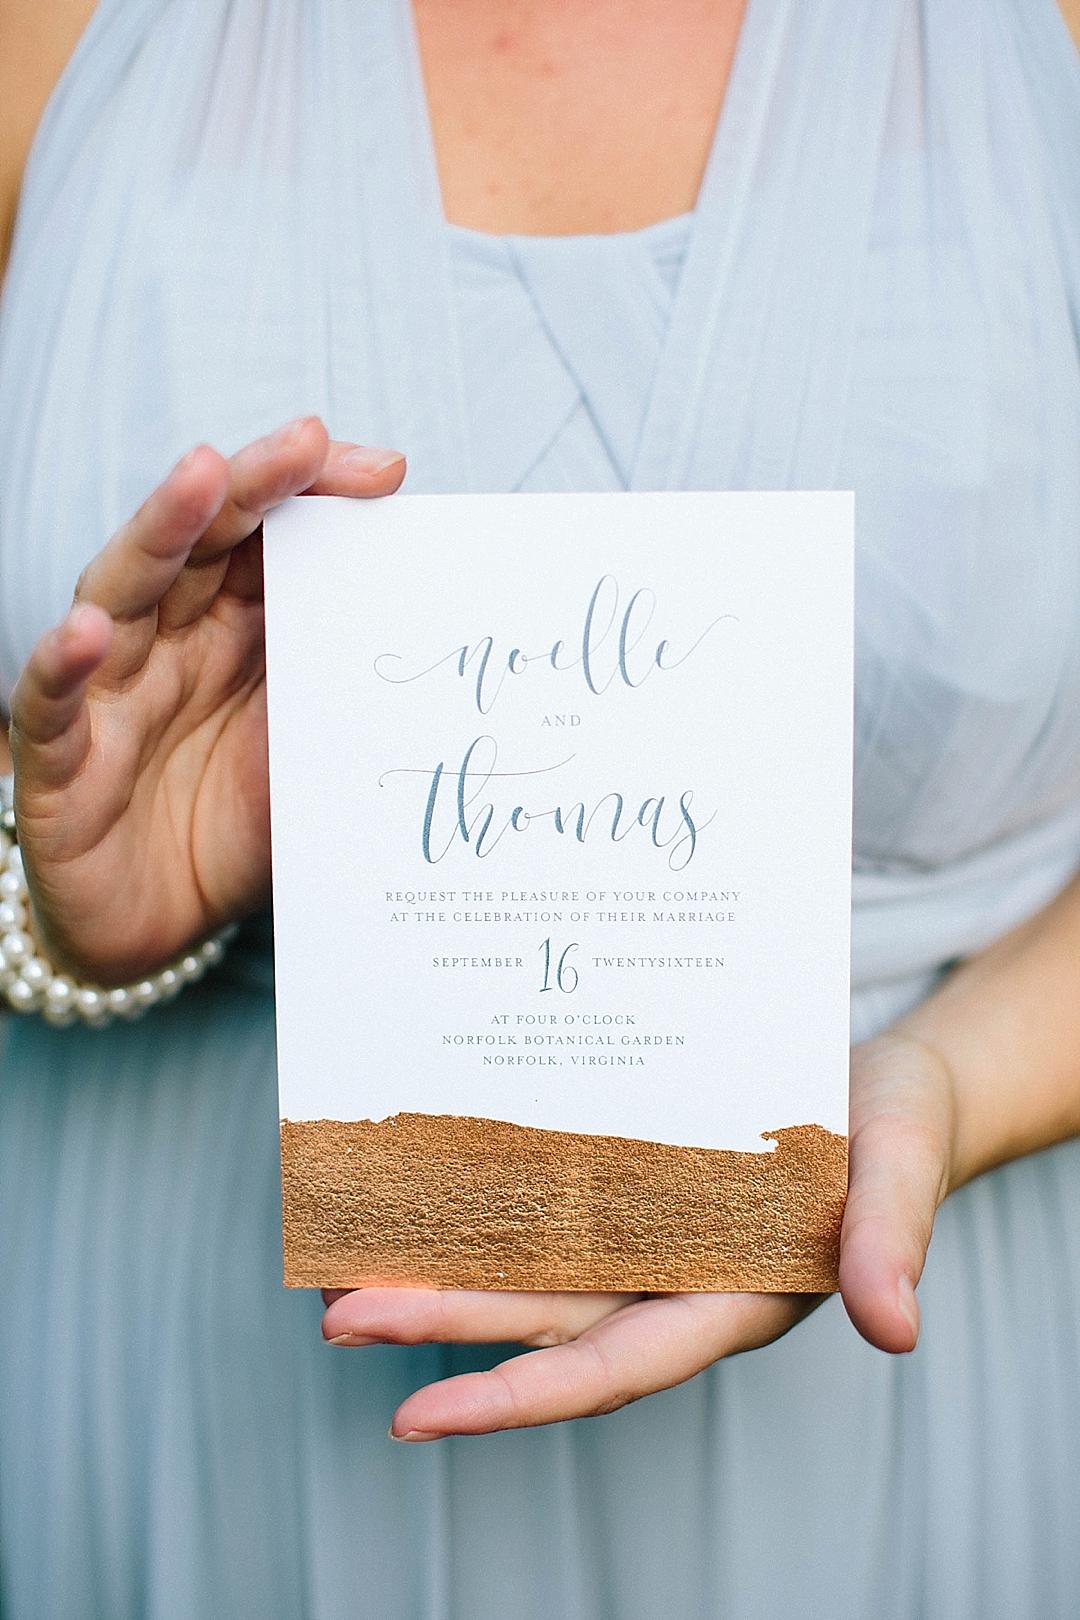 davids bridal for aisle society - invitation